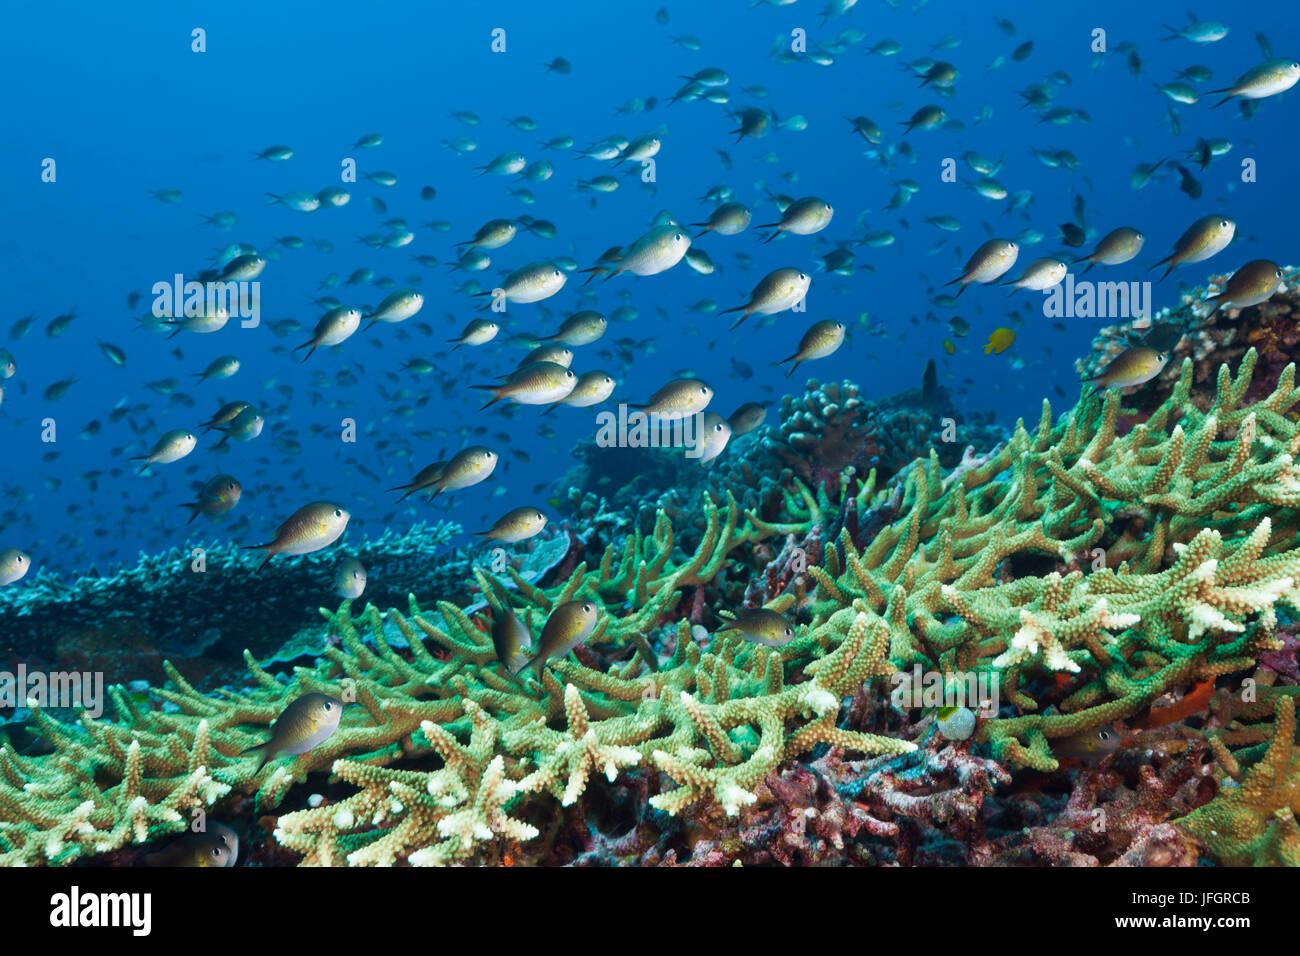 Chromis reef perches, Chromis amoinensis, Florida Islands, the Solomon Islands - Stock Image